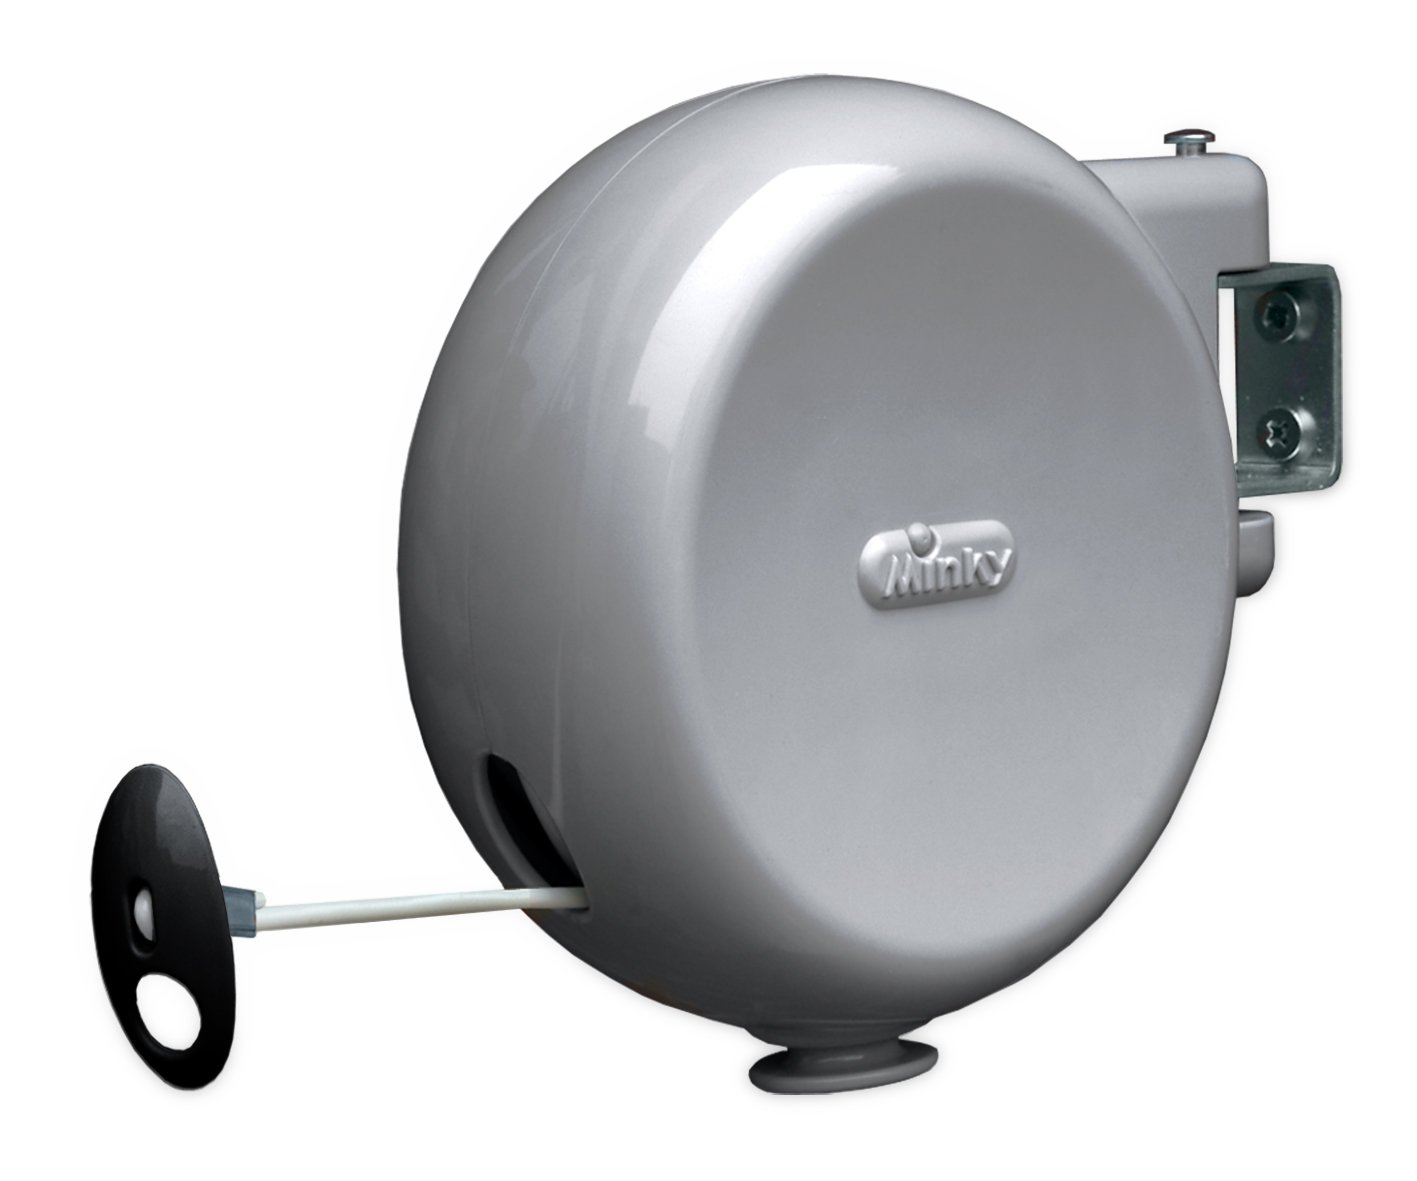 Superb Amazon.com: Minky Retractable Reel Outdoor Dryer, 49 Feet Line Drying  Space: Home U0026 Kitchen